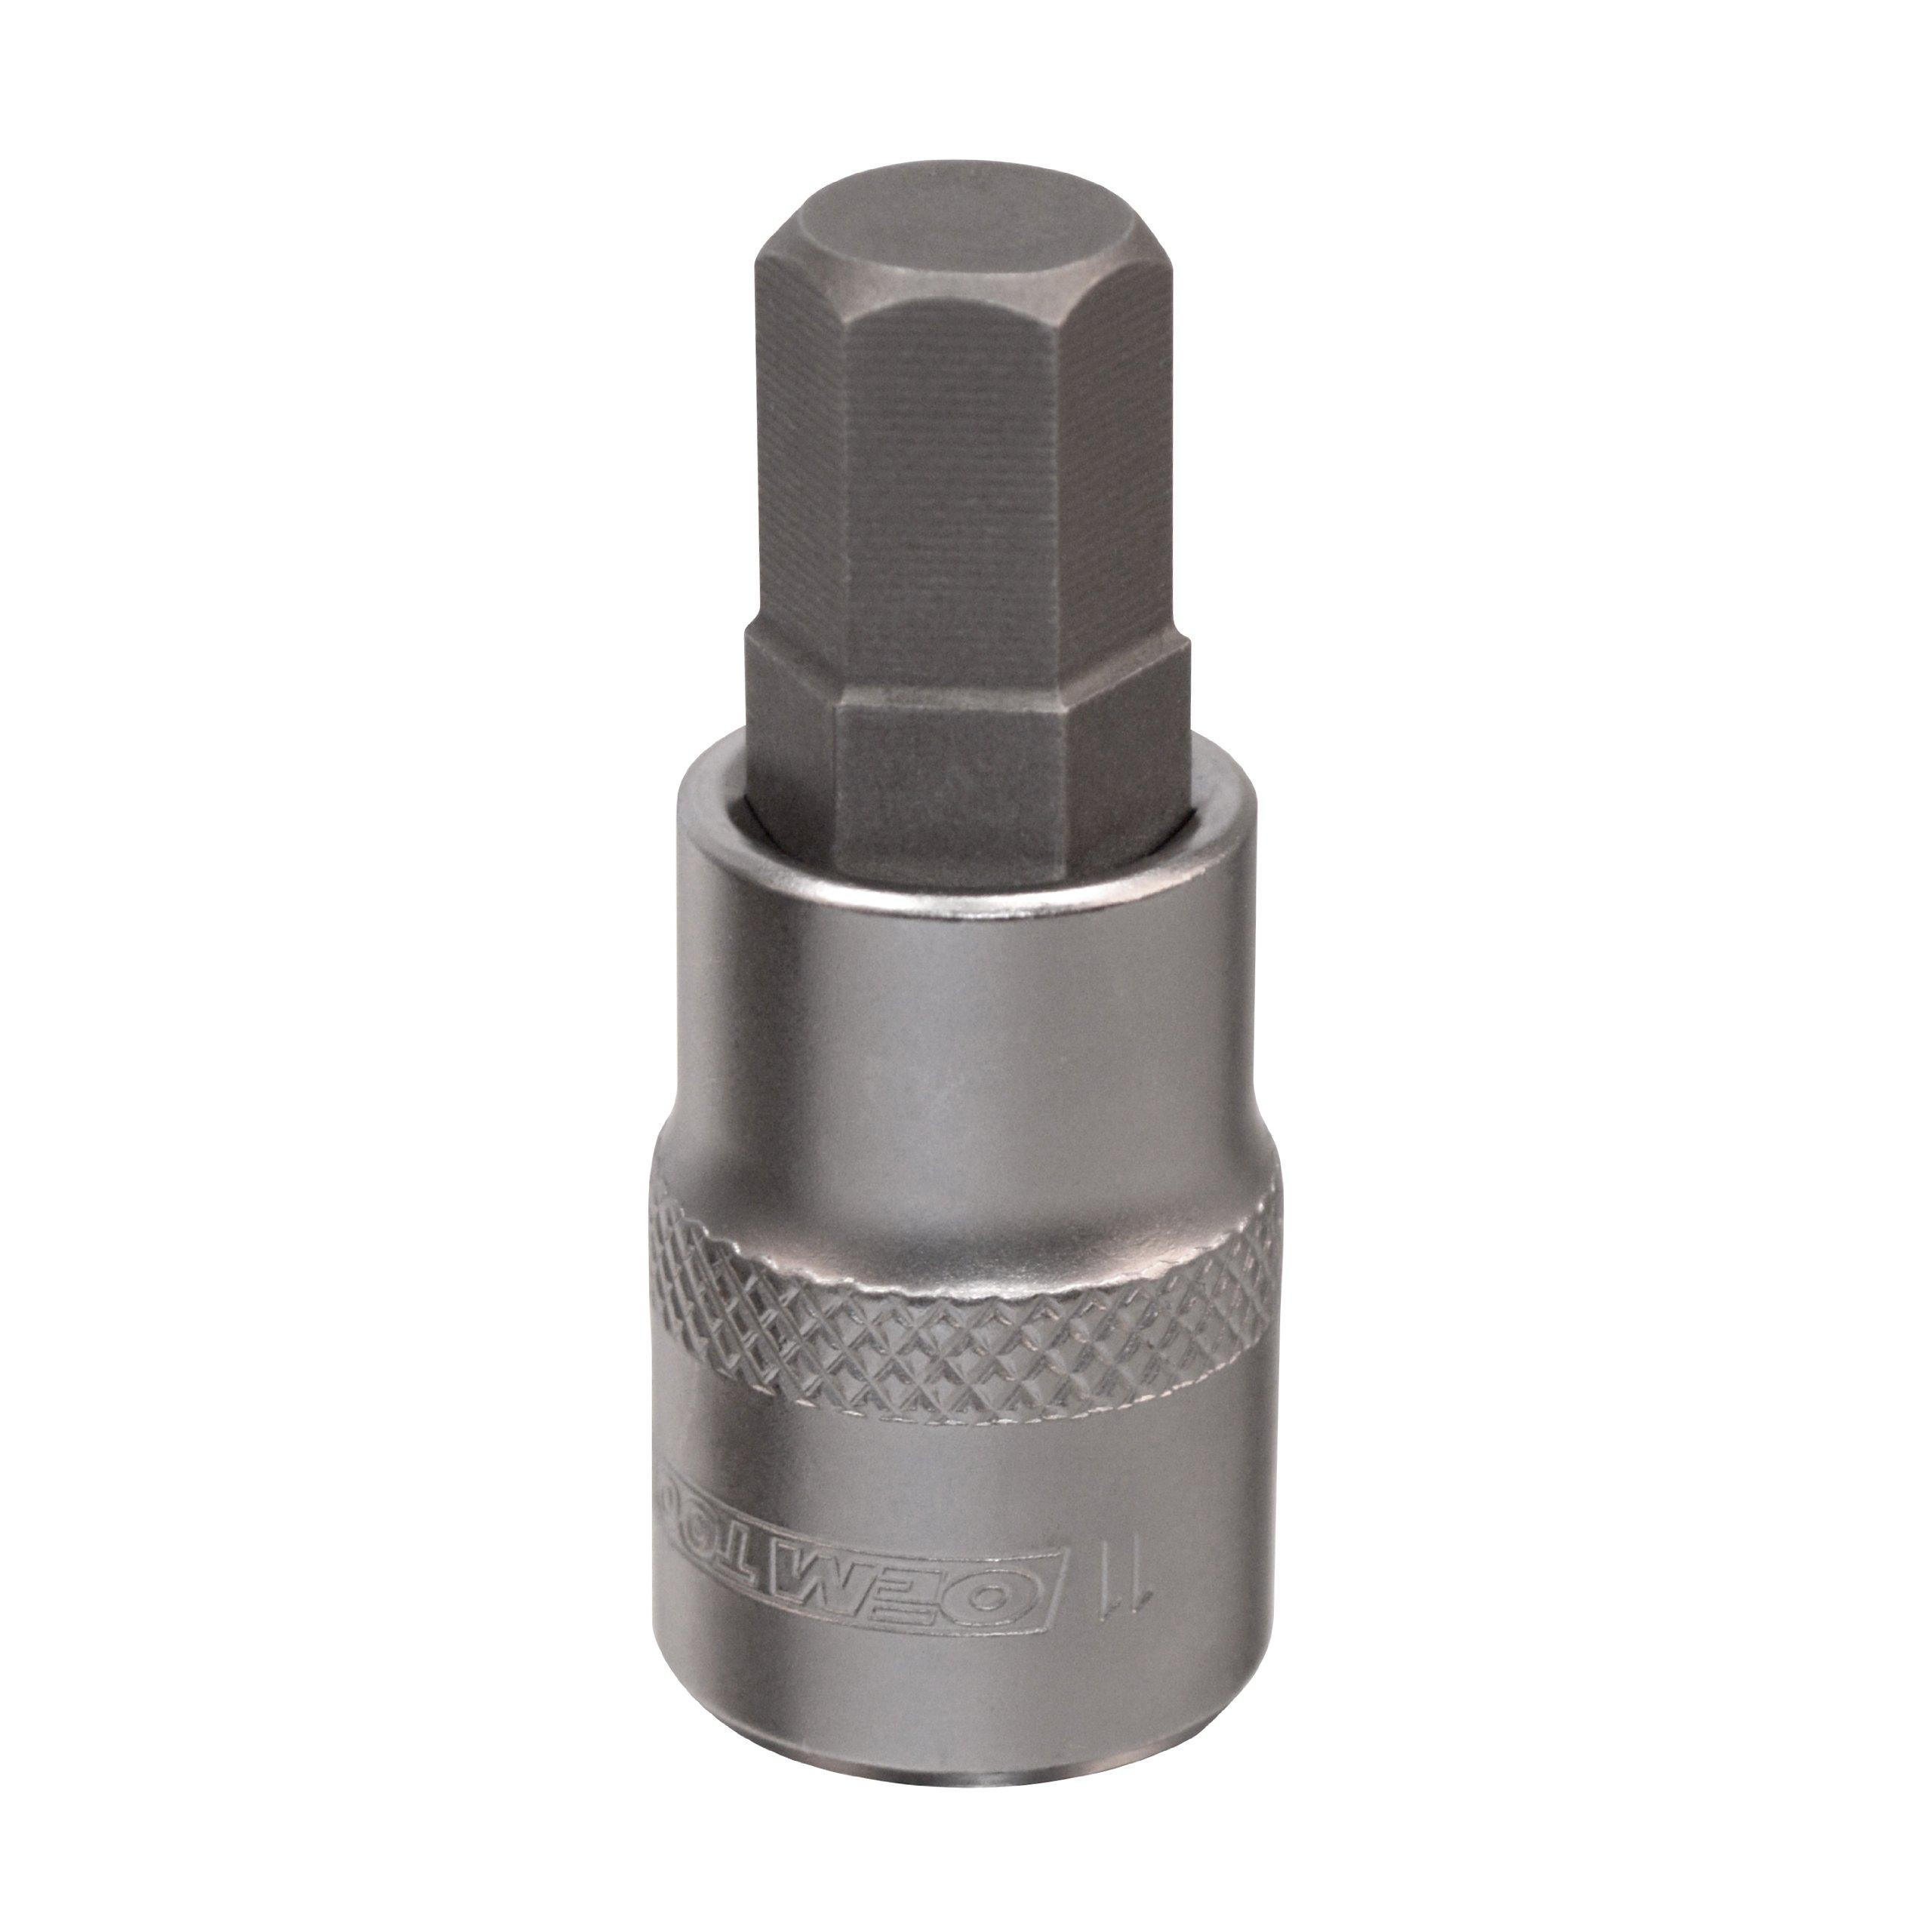 OEMTOOLS 22835 11mm Metric Drive Hex Bit Socket